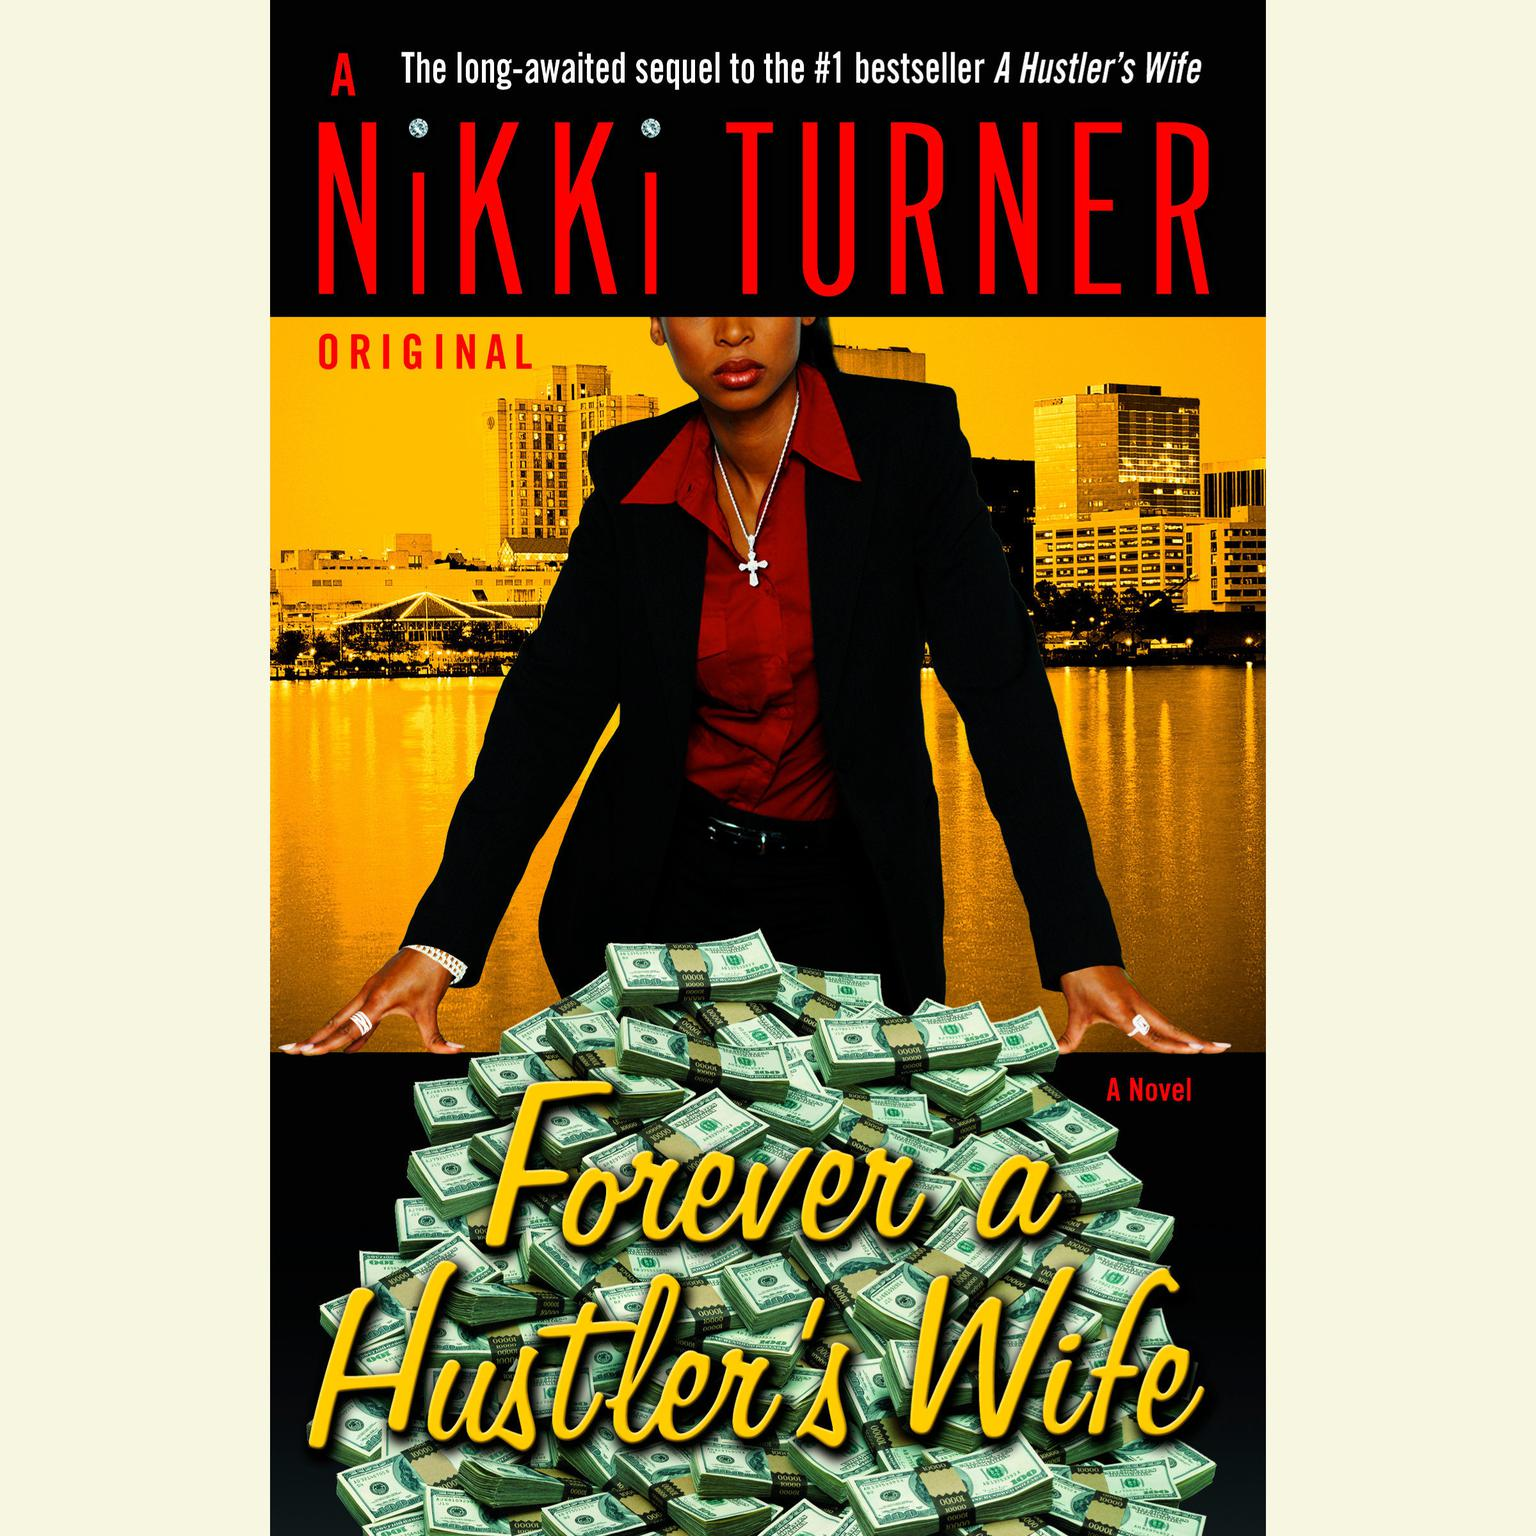 Forever a Hustlers Wife: A Novel Audiobook, by Nikki Turner